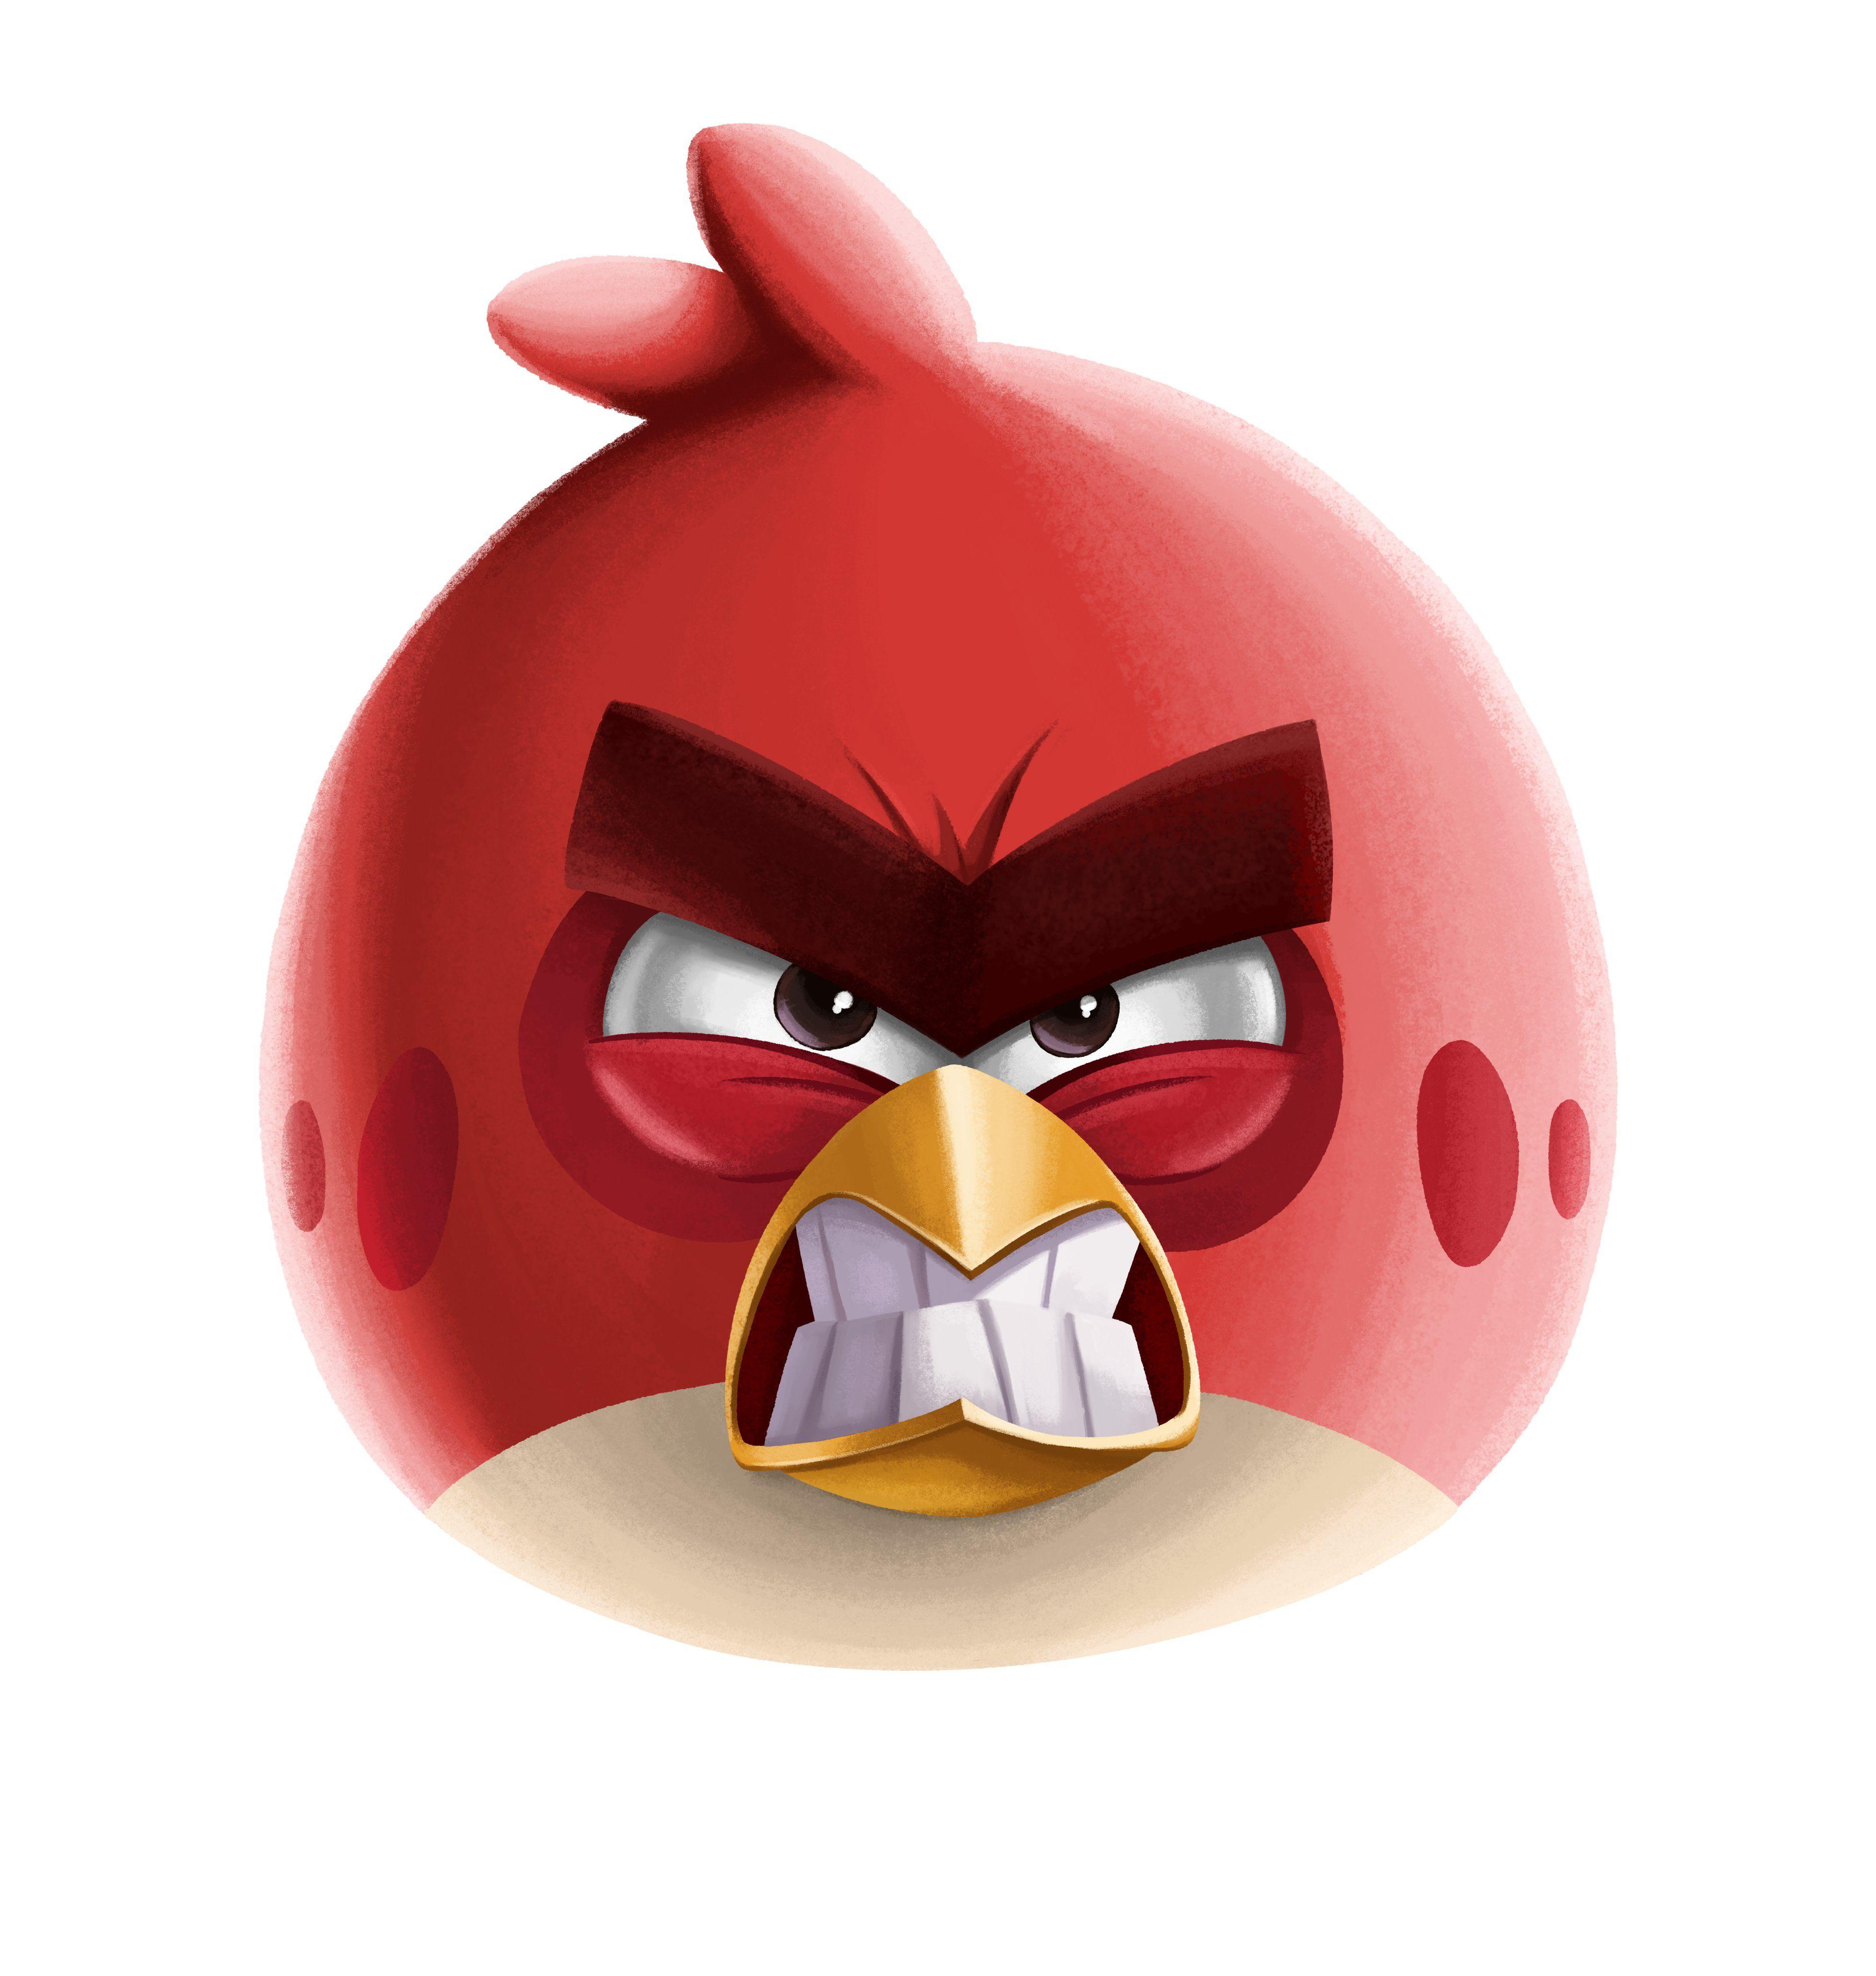 Angry Birds 2 Hack 2018 angry birds 2 | karl marshall | angry birds, birds